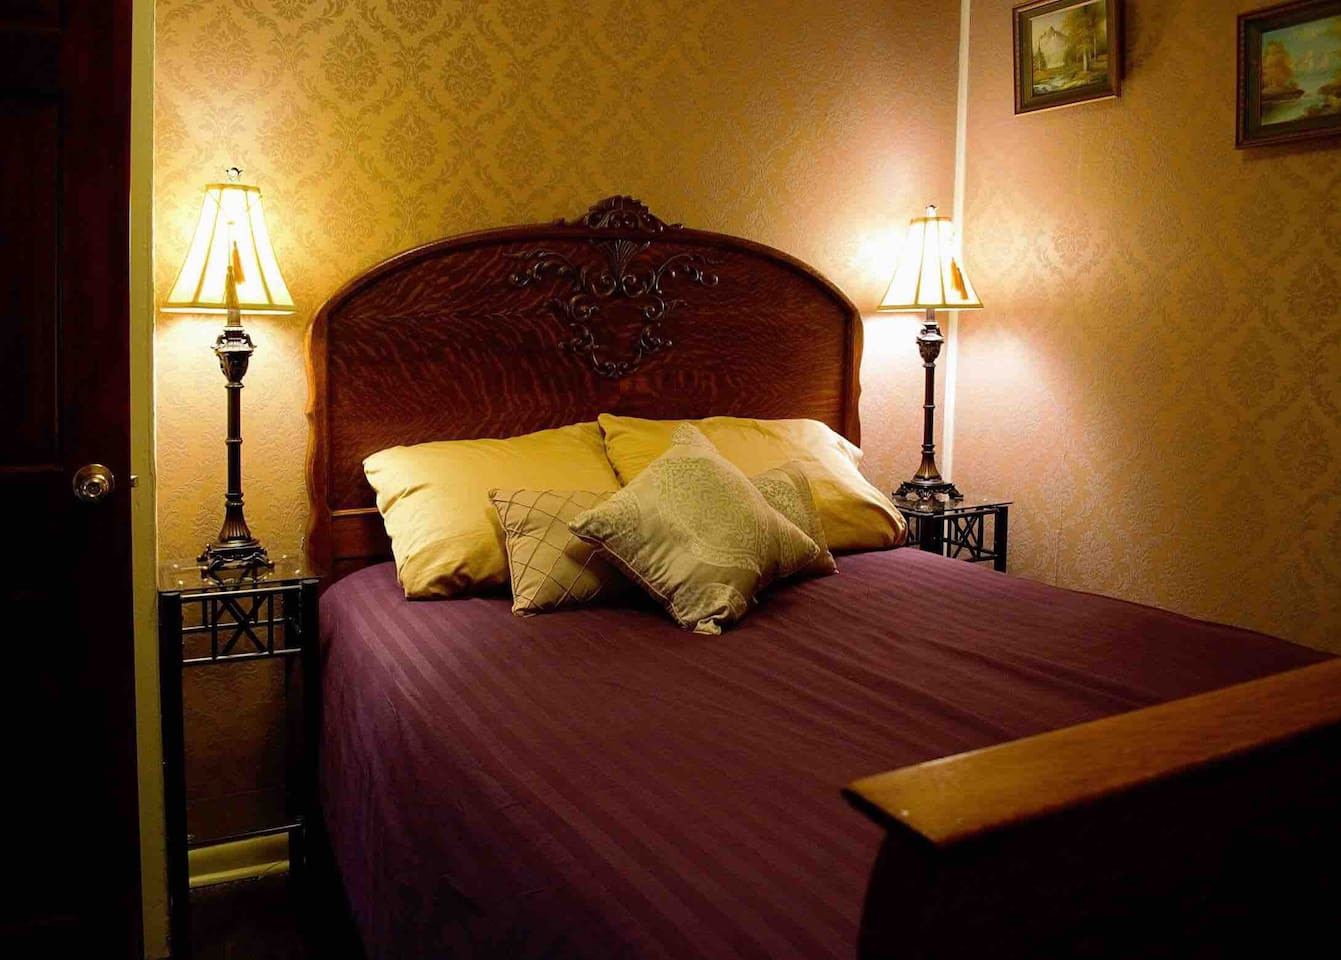 Water Lily Bedroom, nice comfy bed